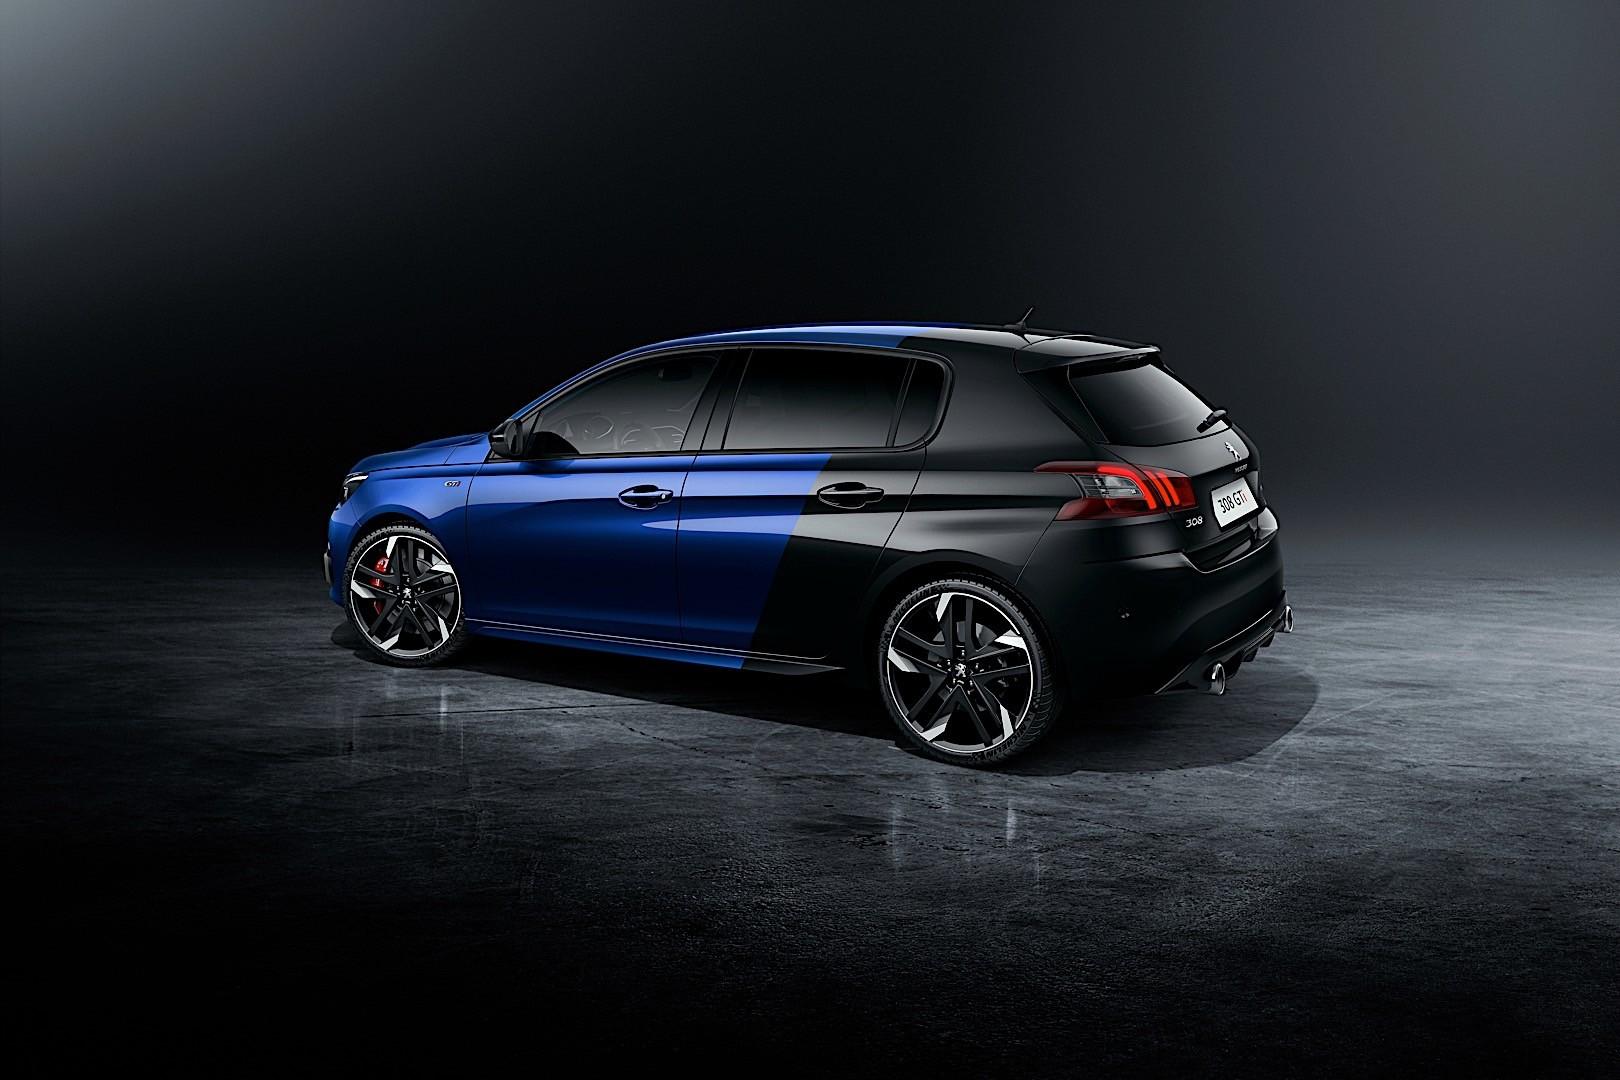 peugeot 308 gti specs - 2017 - autoevolution